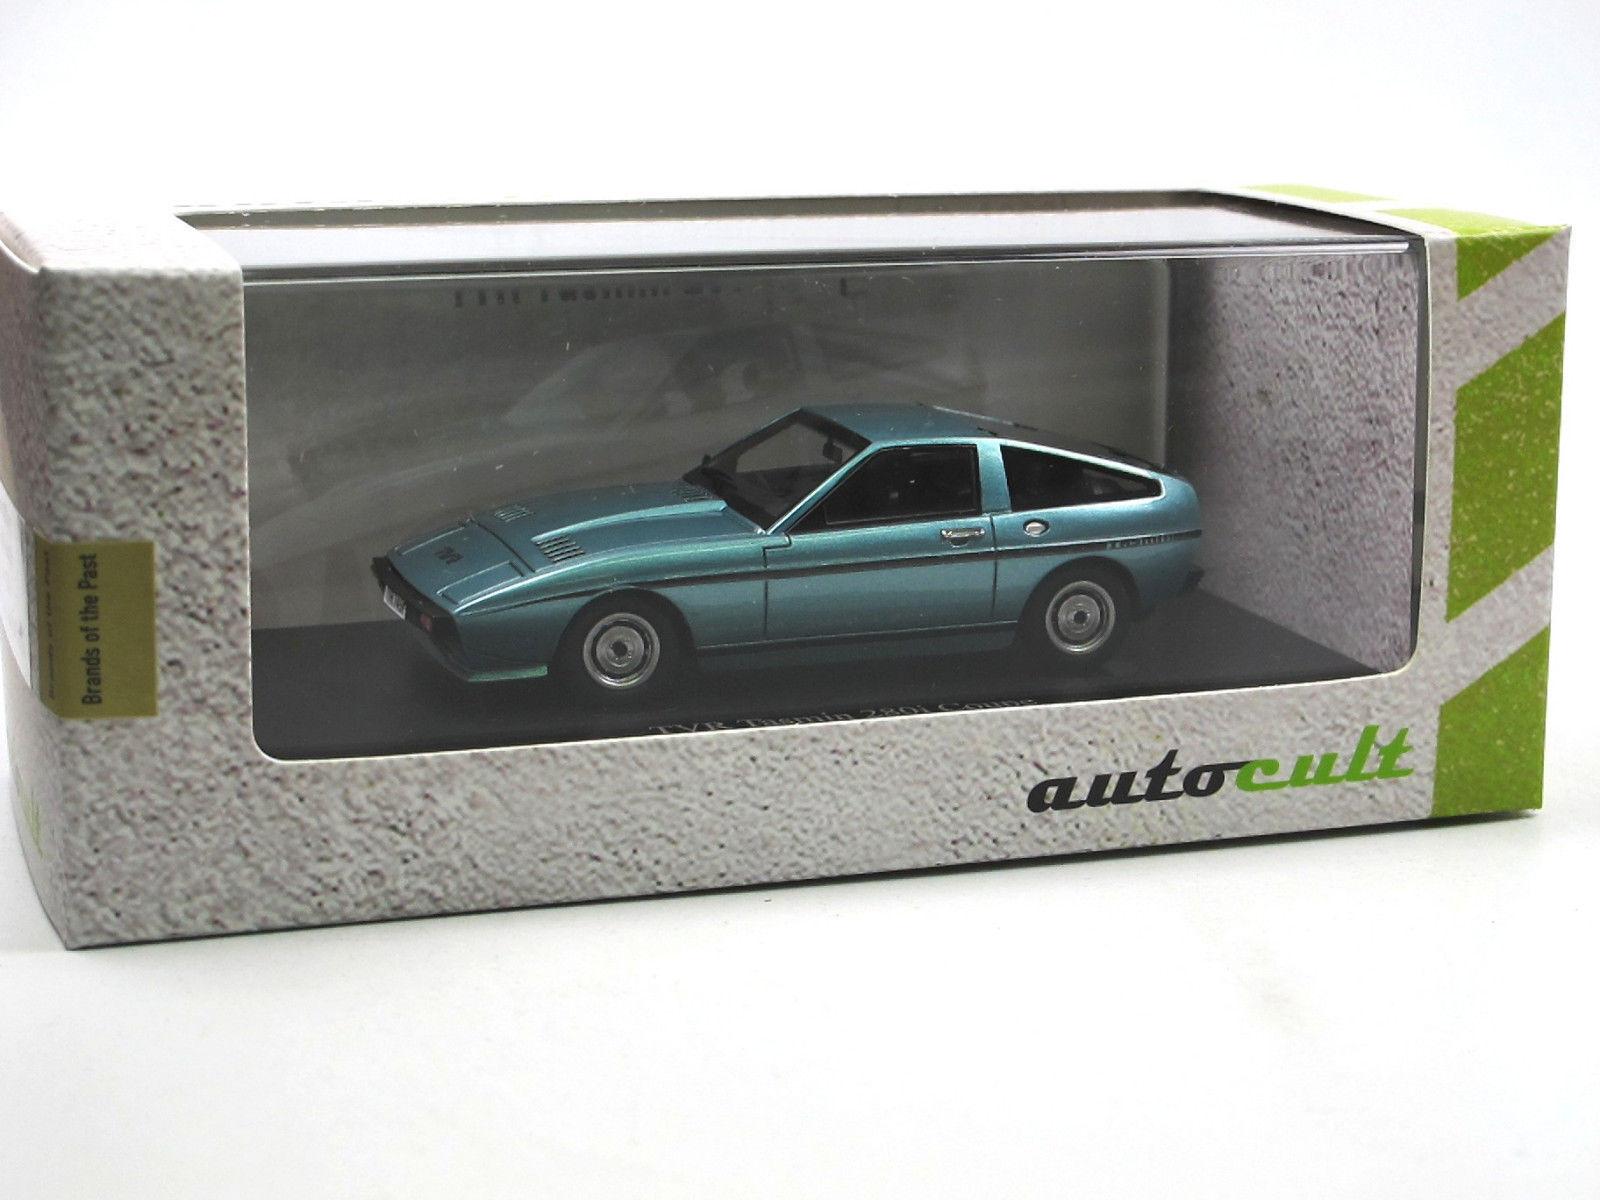 Autocult atc - 02010 tvr tasmin 280i coupé blau metallic 1 43 skala